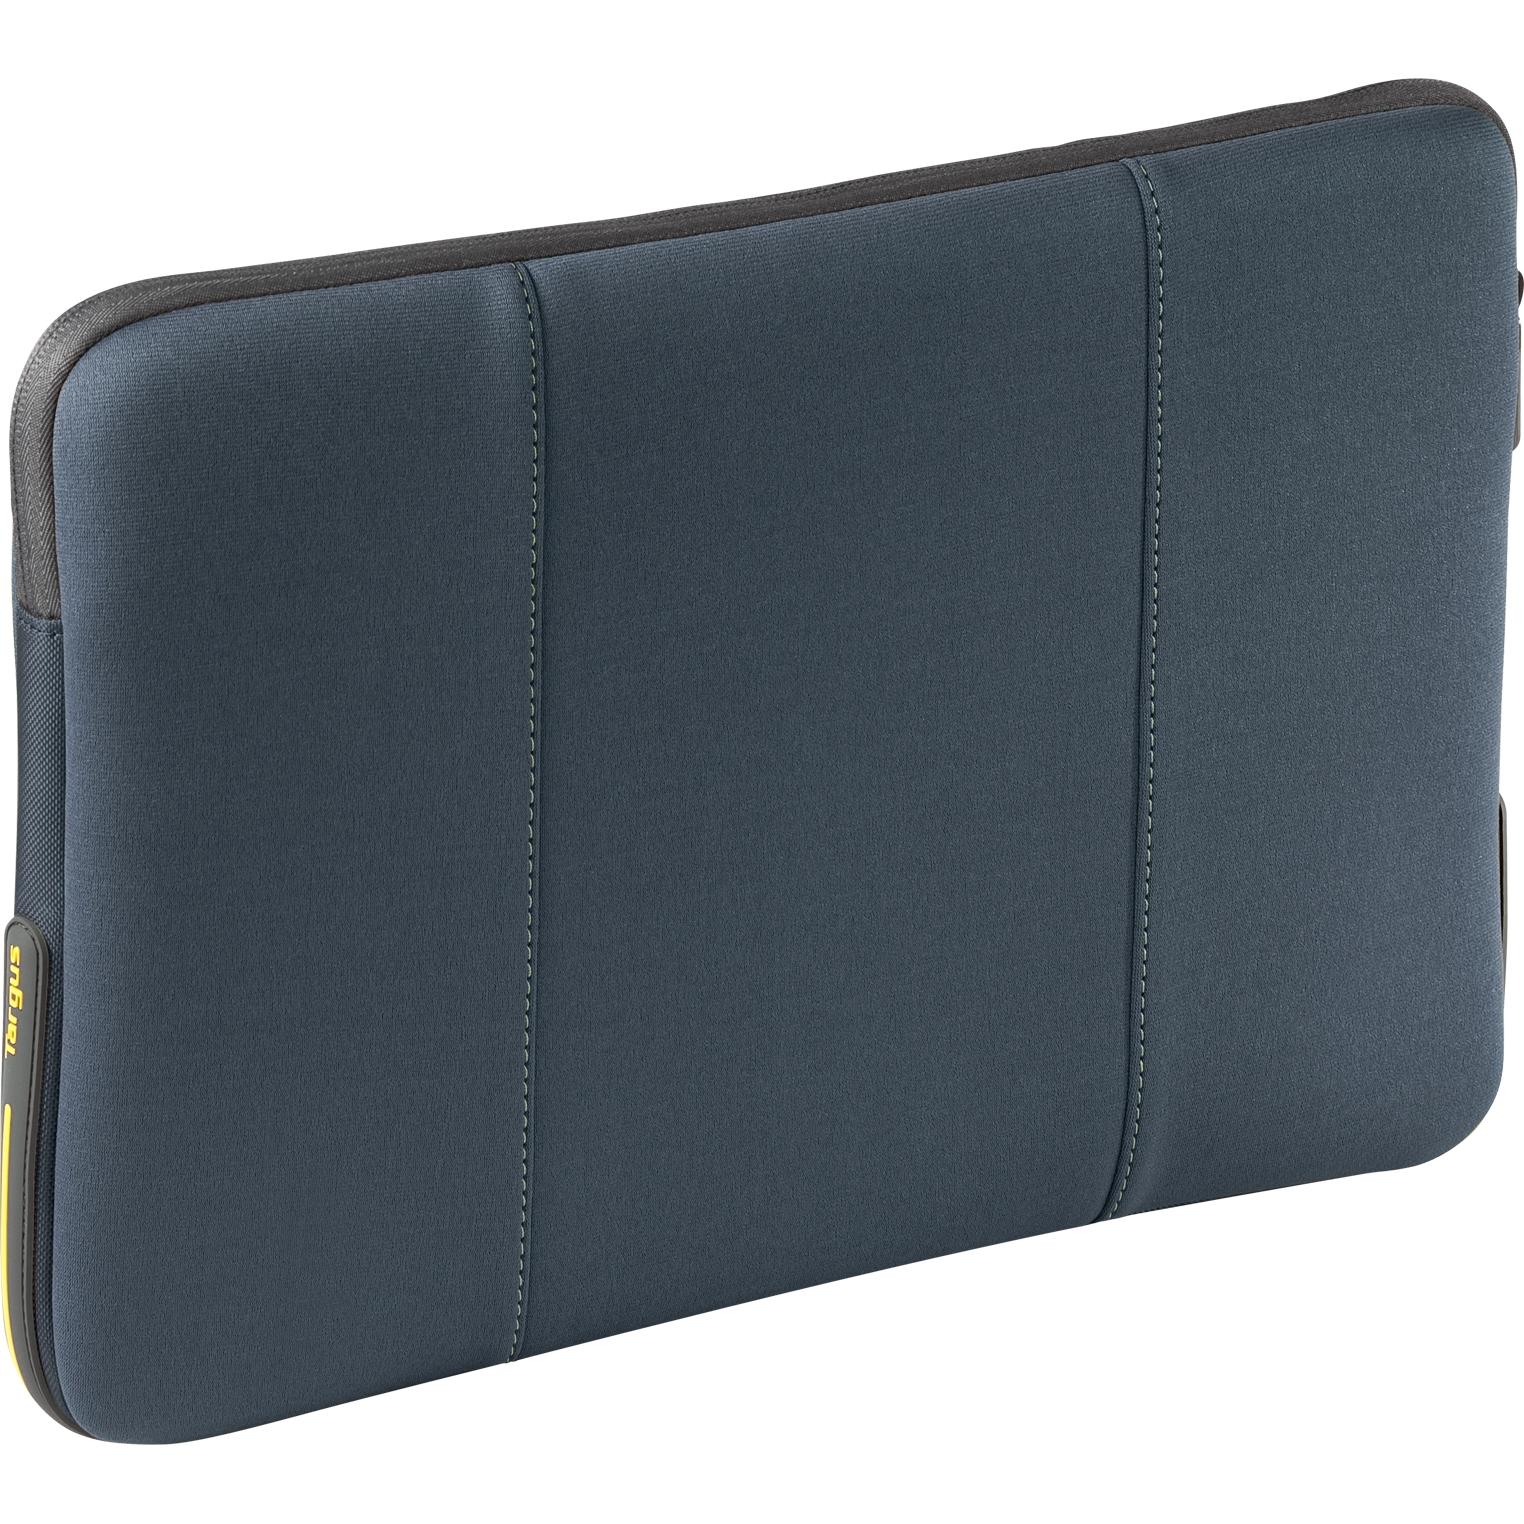 impax sleeve for 17 macbook pro tss27802us blue. Black Bedroom Furniture Sets. Home Design Ideas